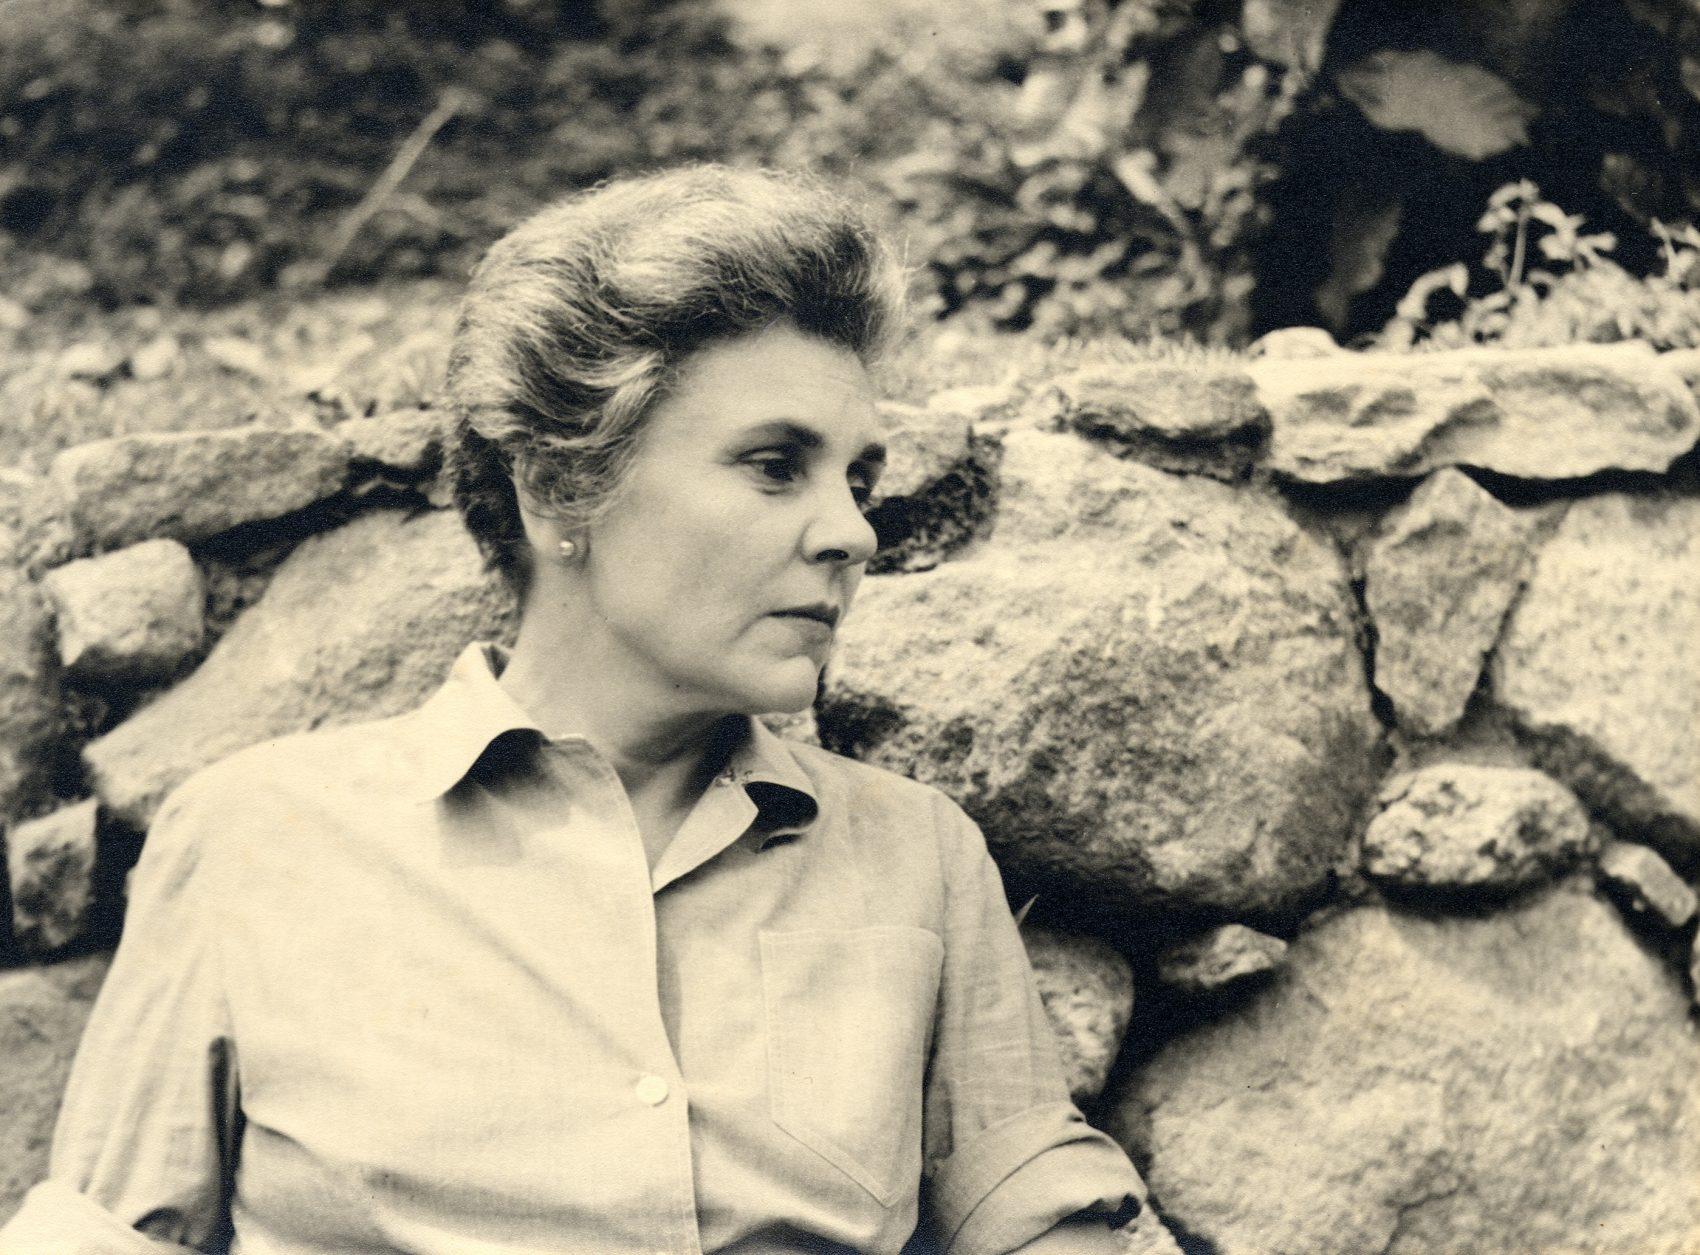 Poet Elizabeth Bishop in Brazil in 1955. (Courtesy Houghton Mifflin)